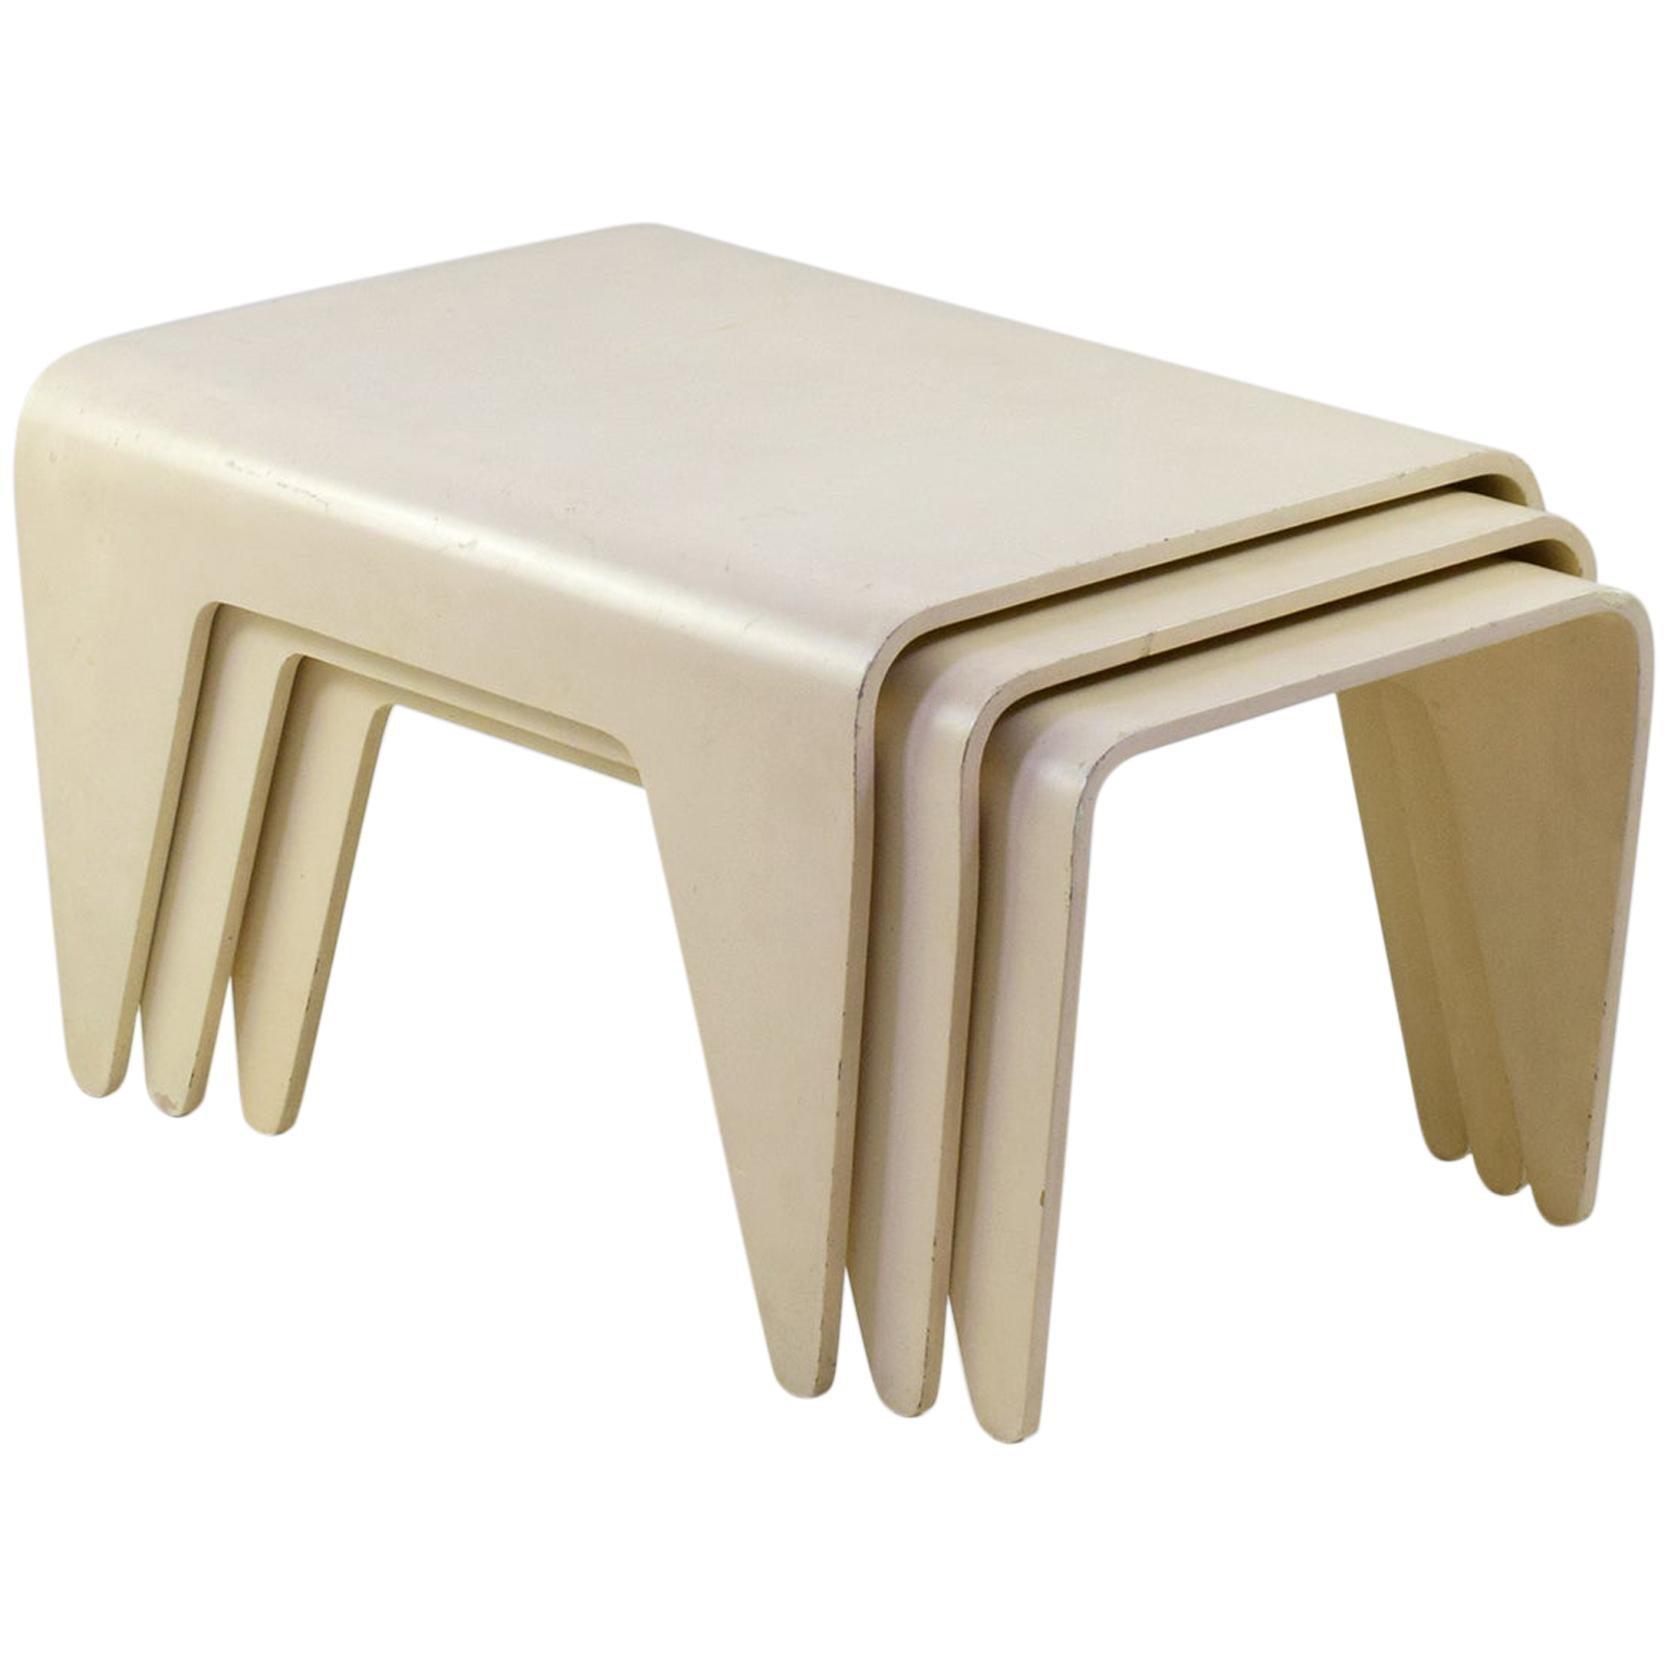 Marcel Breuer, 'Isokon Nesting Tables,' Set of Three Tables, for Isokon, 1936